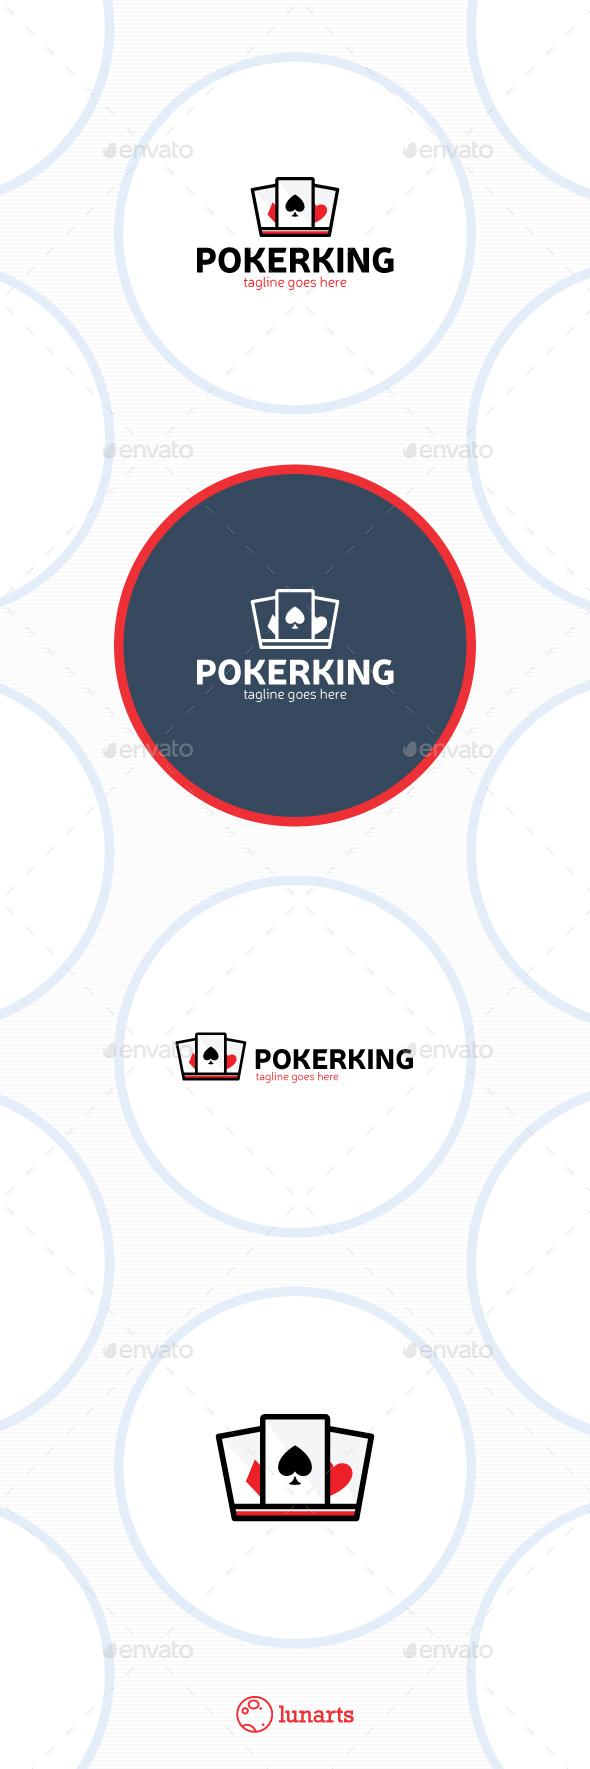 Poker King Logo - Casino